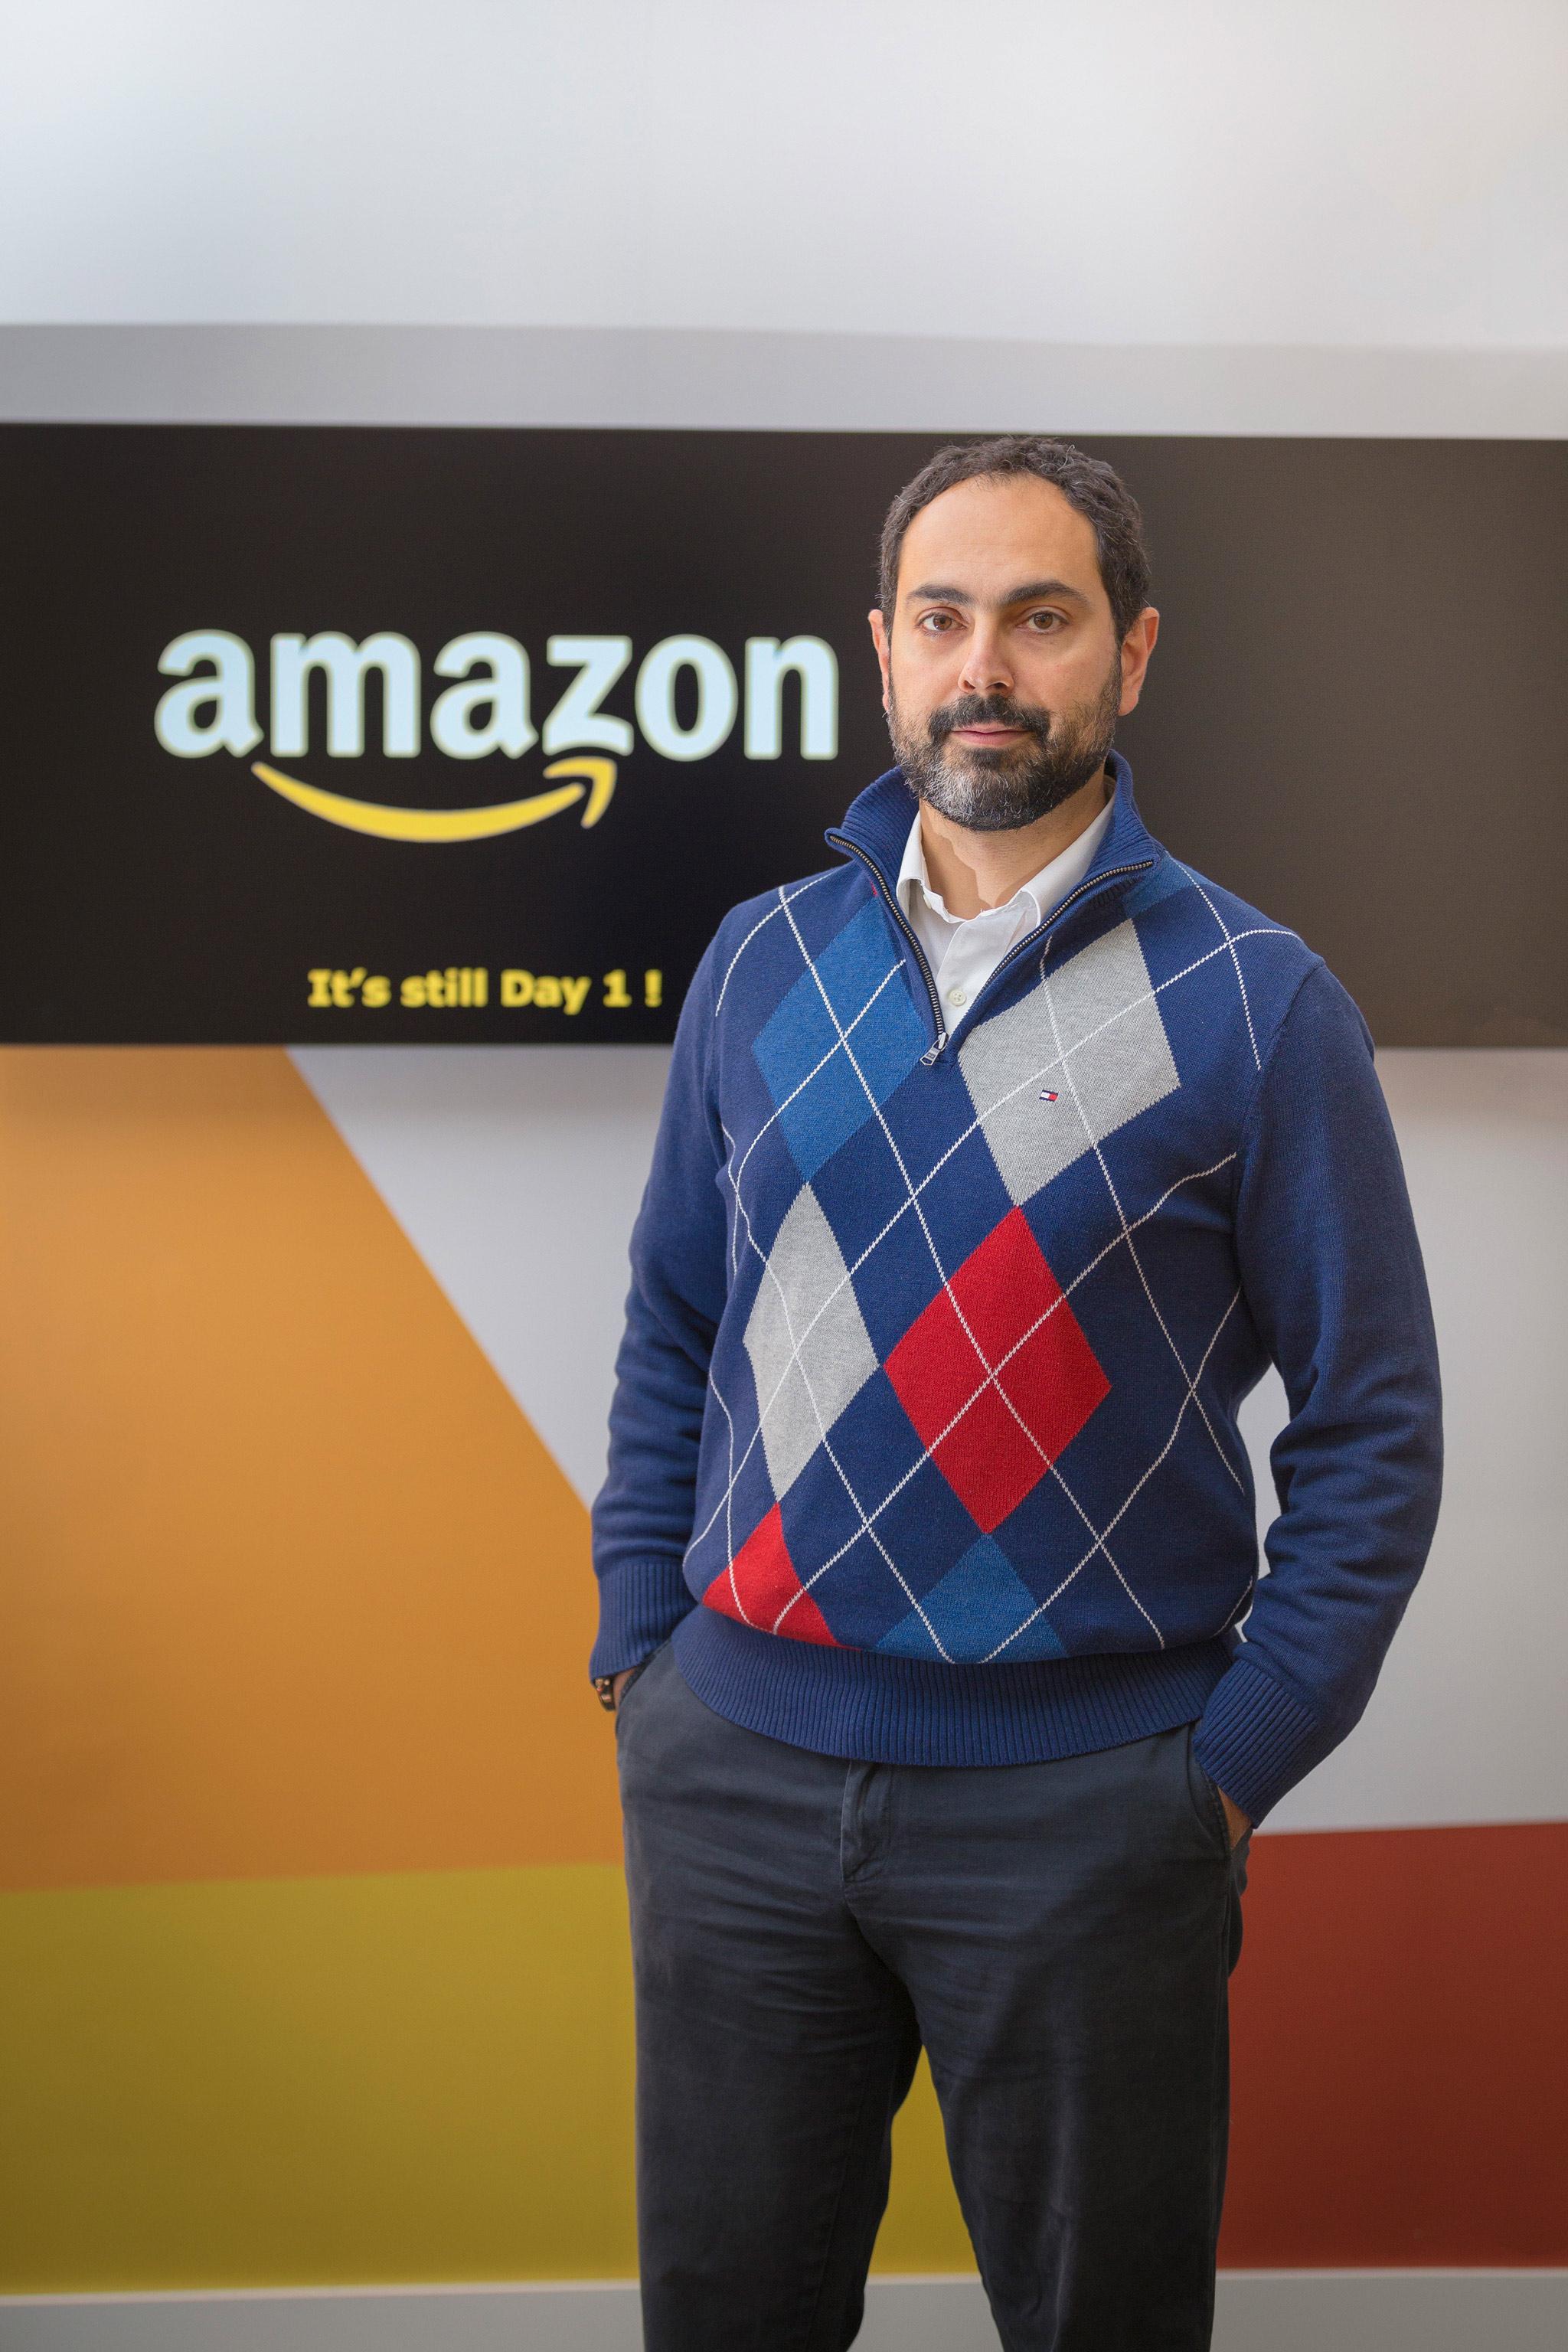 Nabil_de_Marco_Director_Automotive_europe_at_Amazon